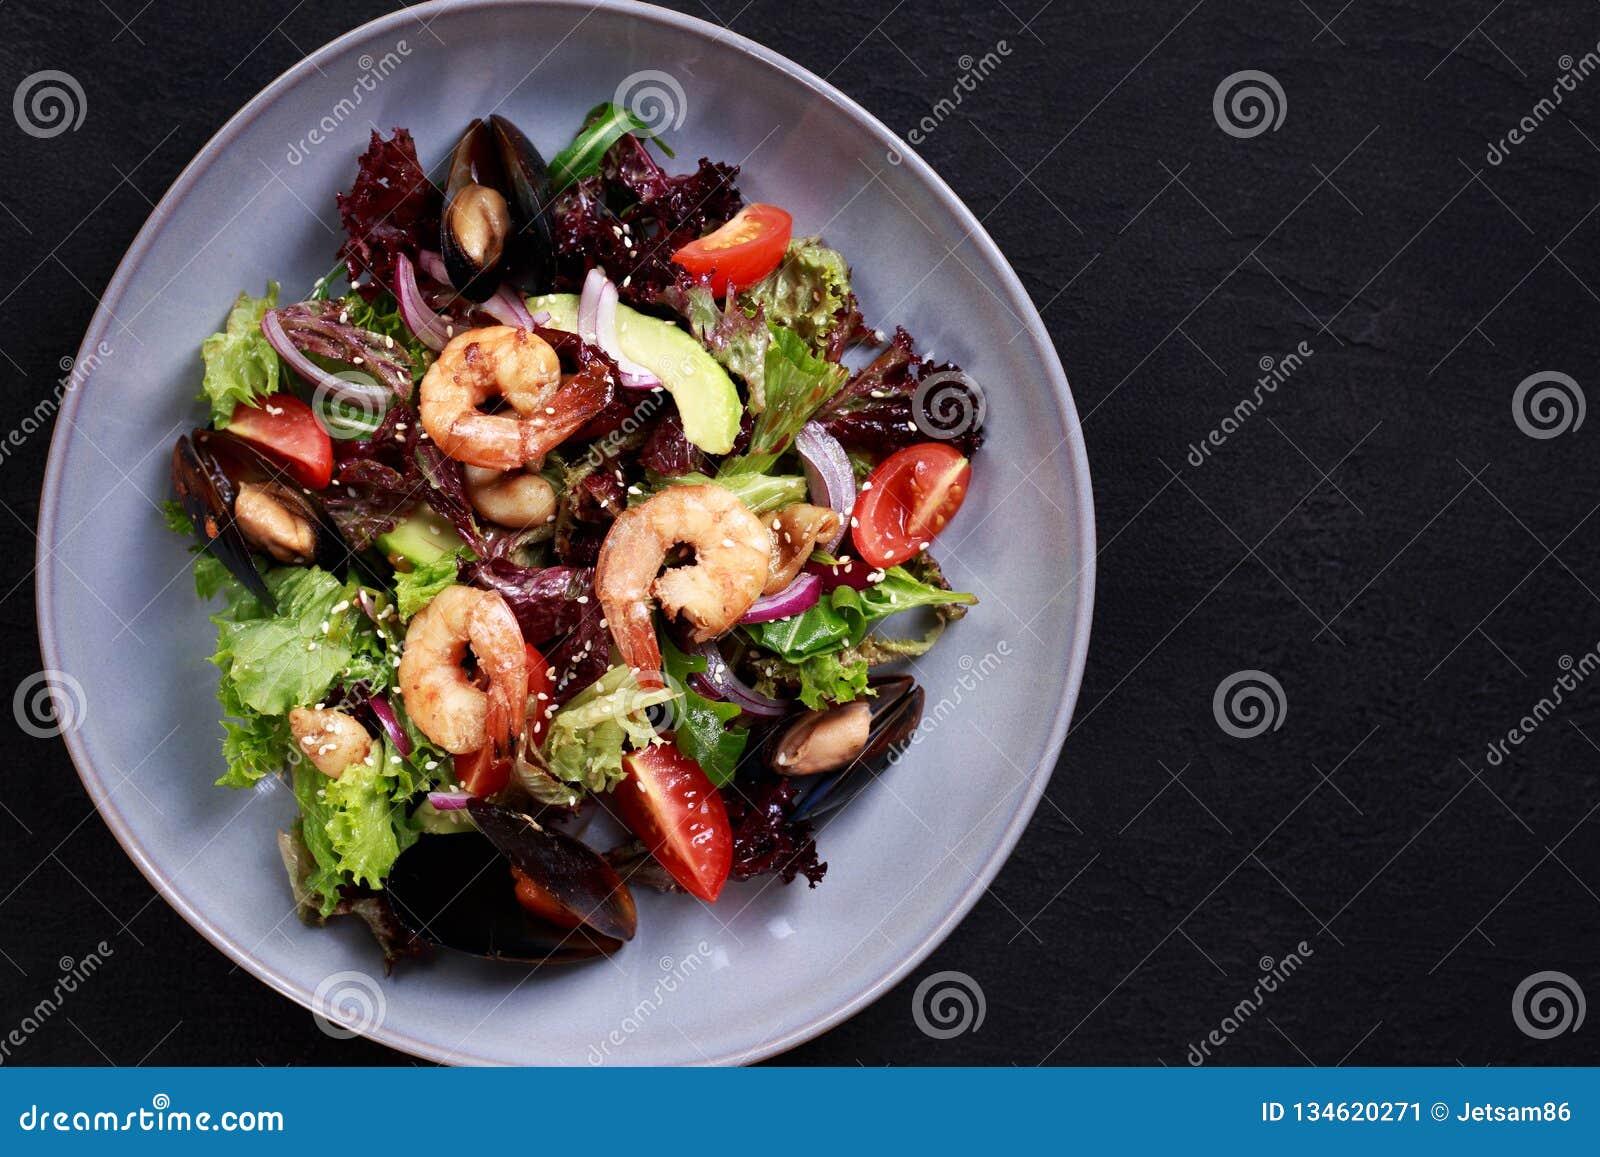 Seafood Salad, Mediterranean Food, Restaurant Menu Stock